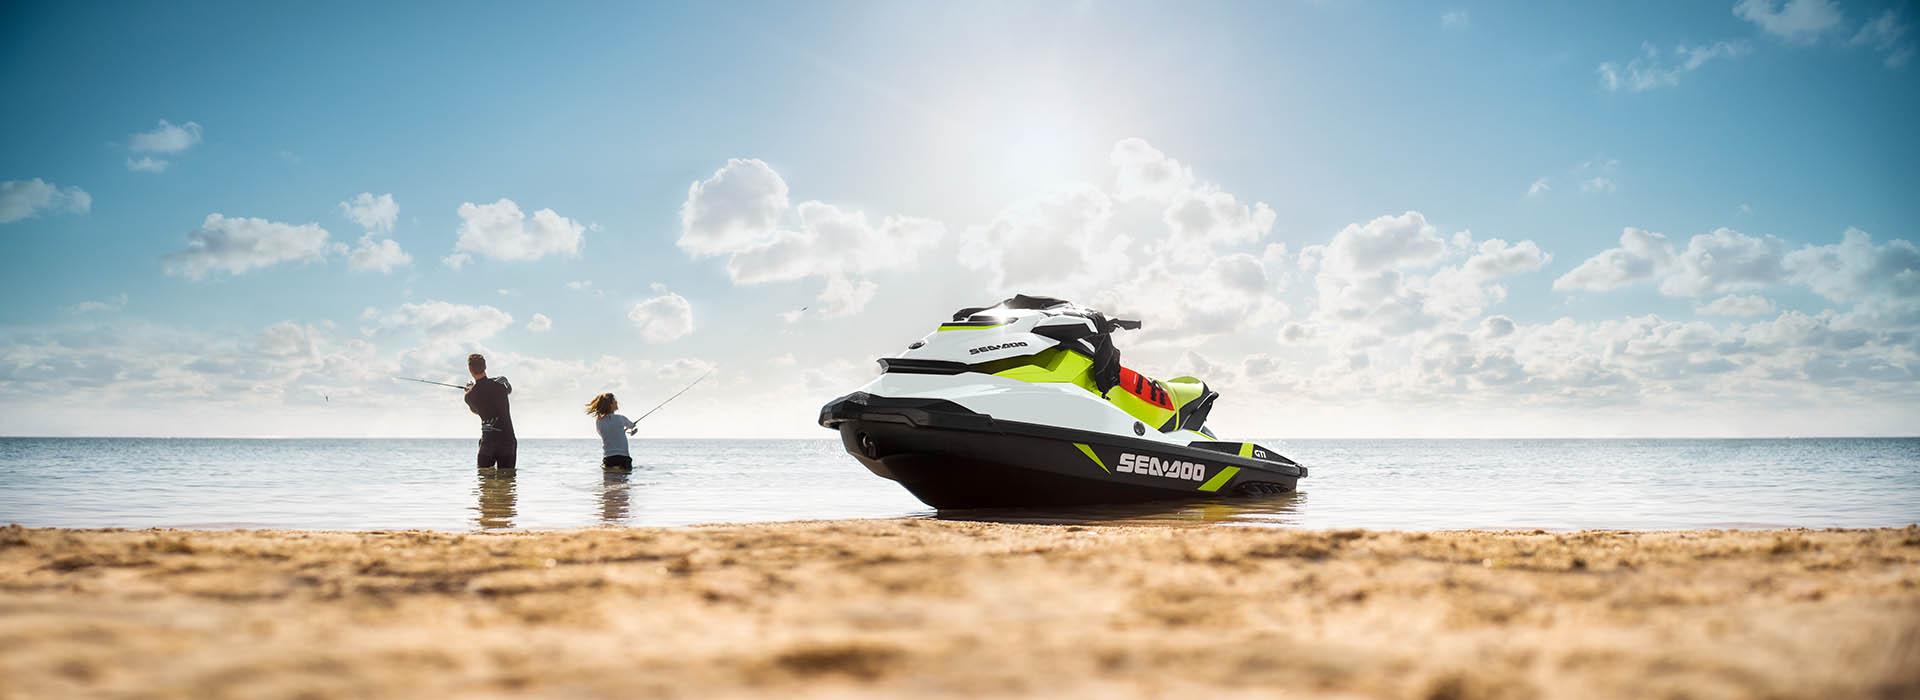 Segway Trip Javea Moto de agua